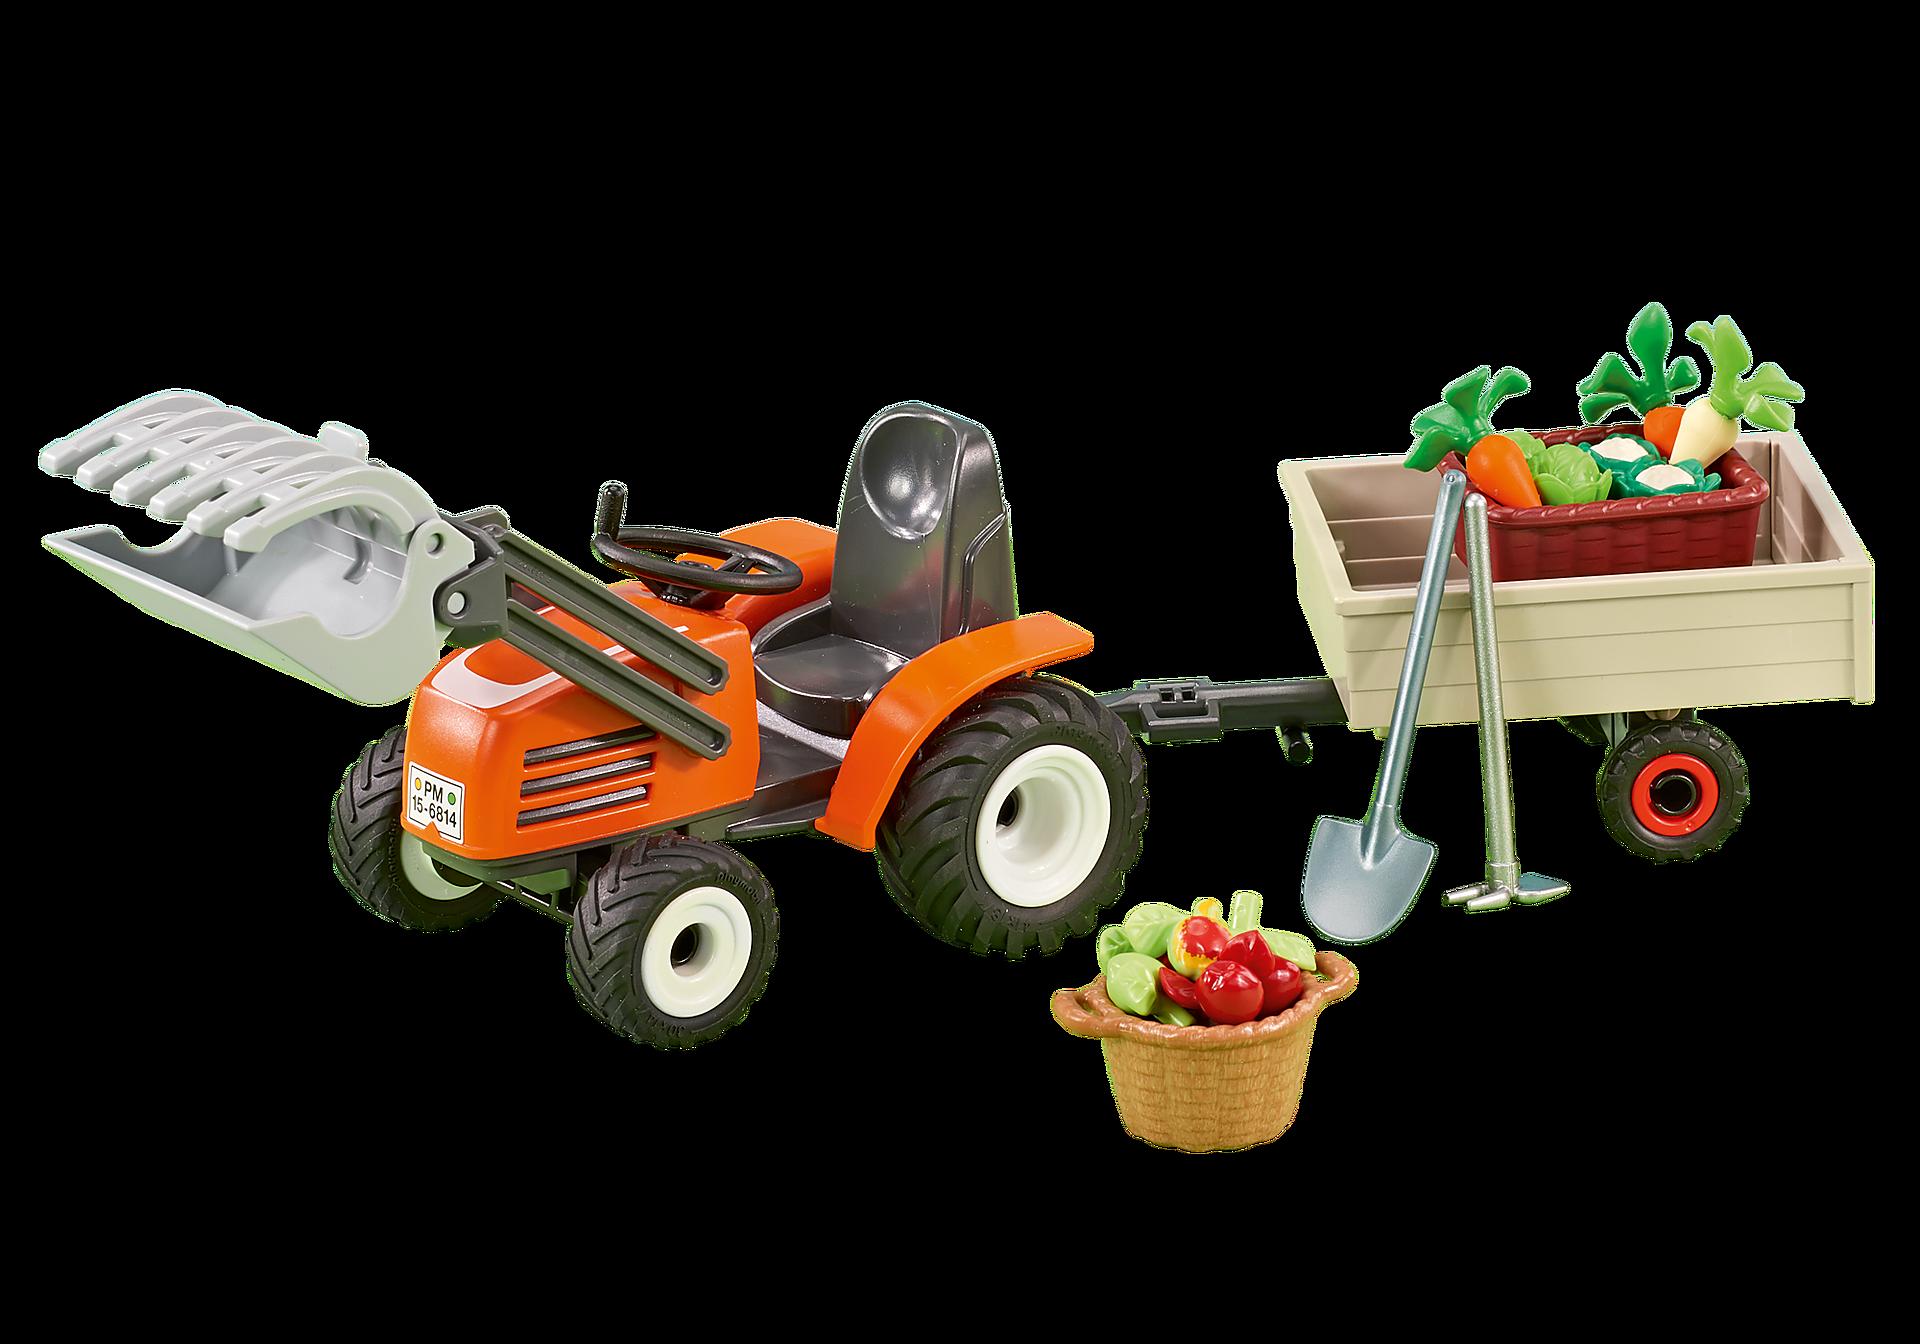 http://media.playmobil.com/i/playmobil/6537_product_detail/Trattorino con carretto frutta e verdura